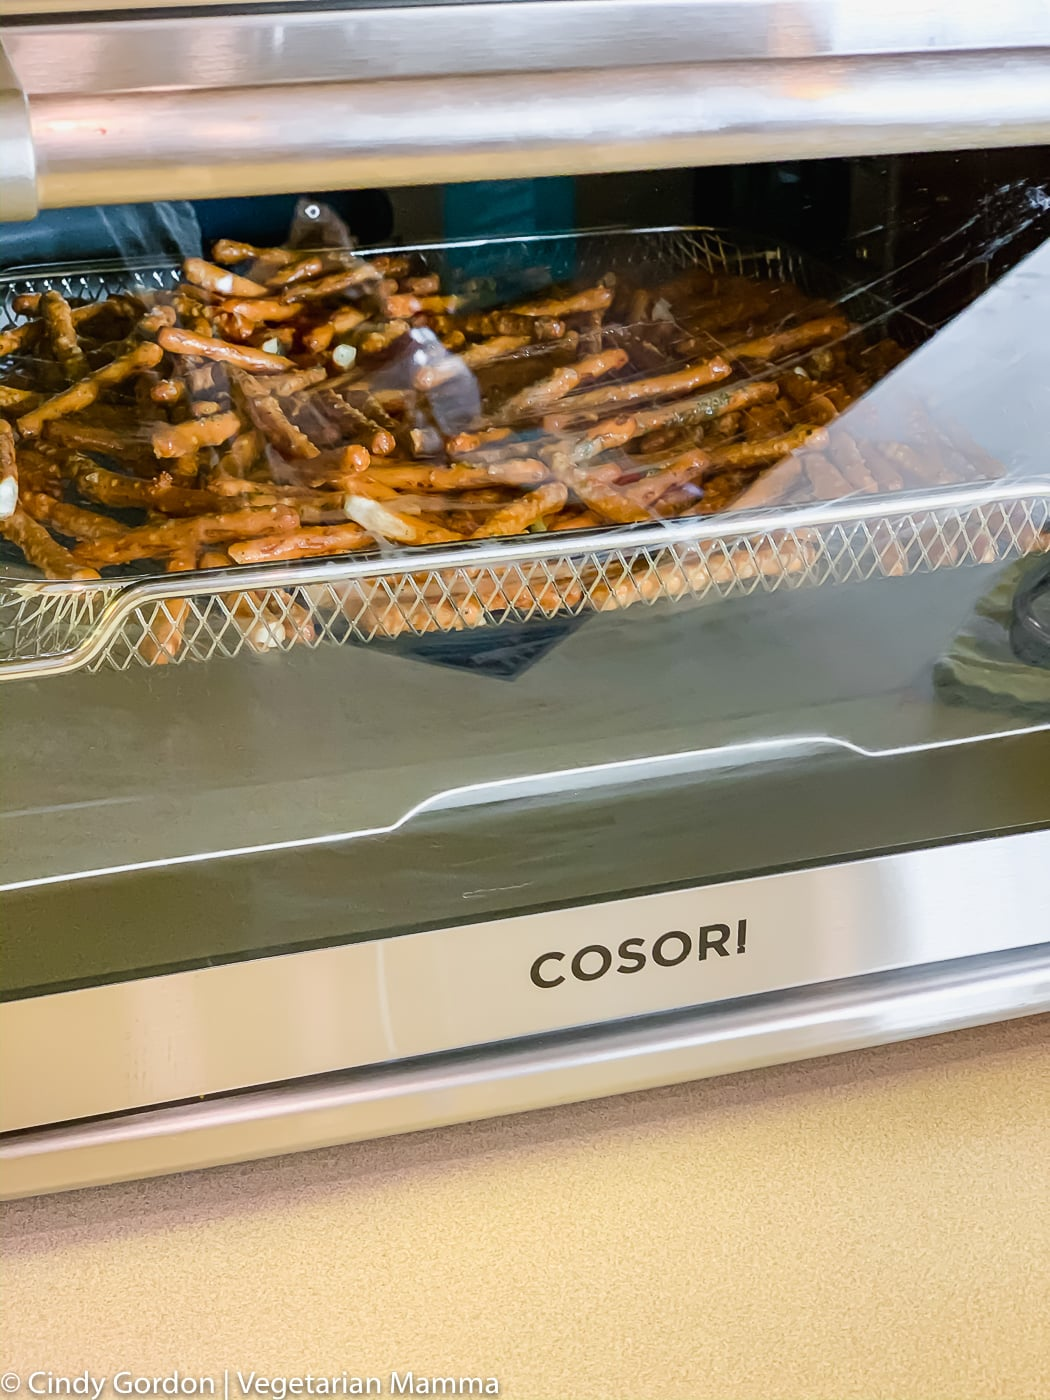 air fryer seasoned pretzels in the air fryer oven